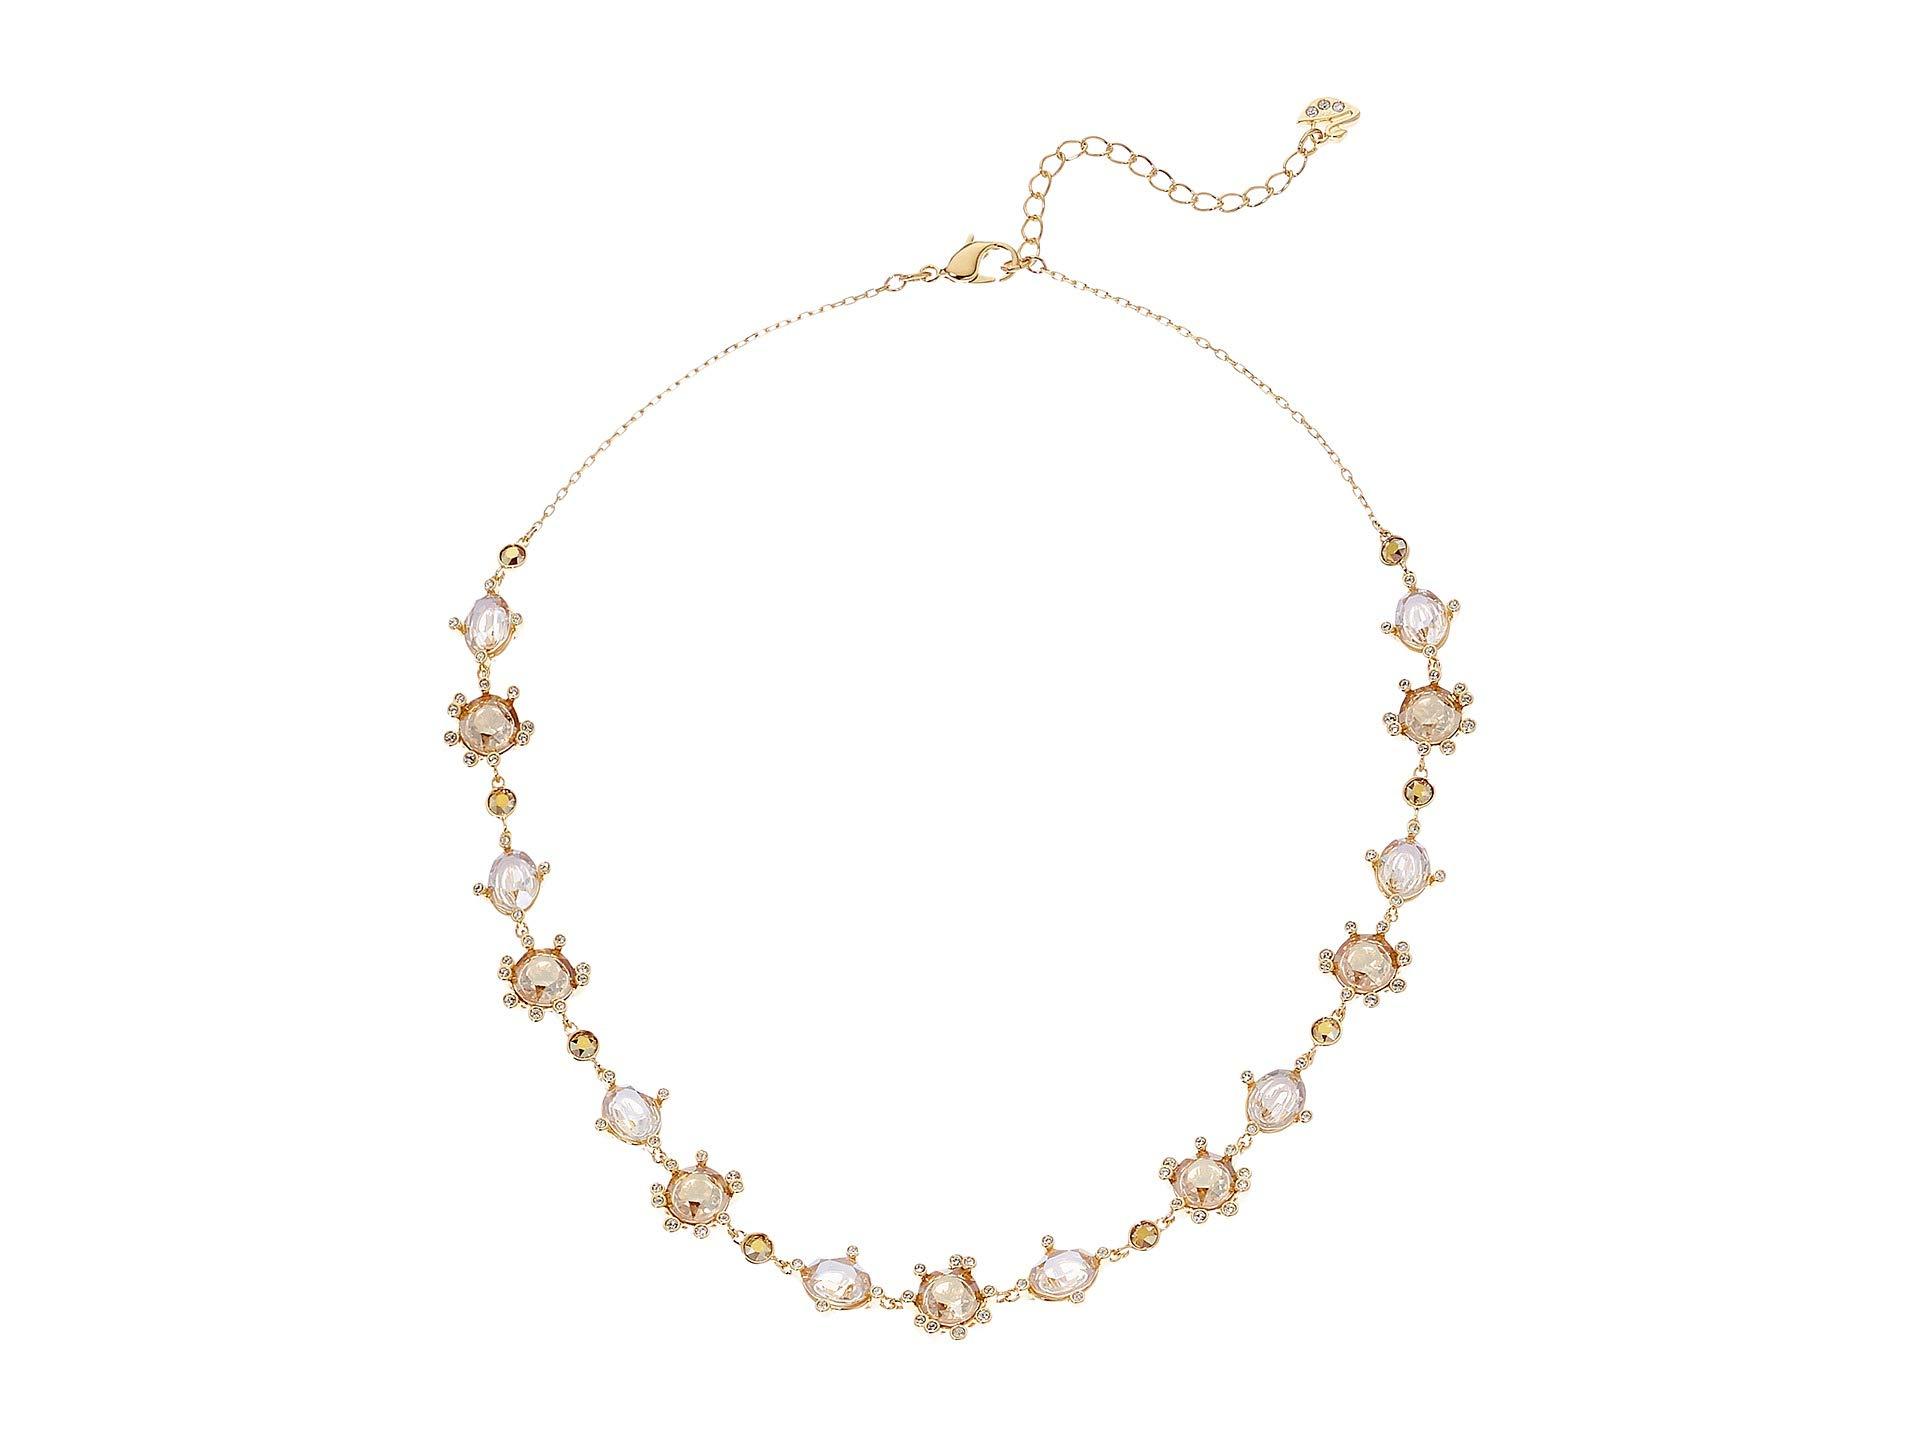 Swarovski Olive Necklace, Gold Plating 5460987 by SWAROVSKI